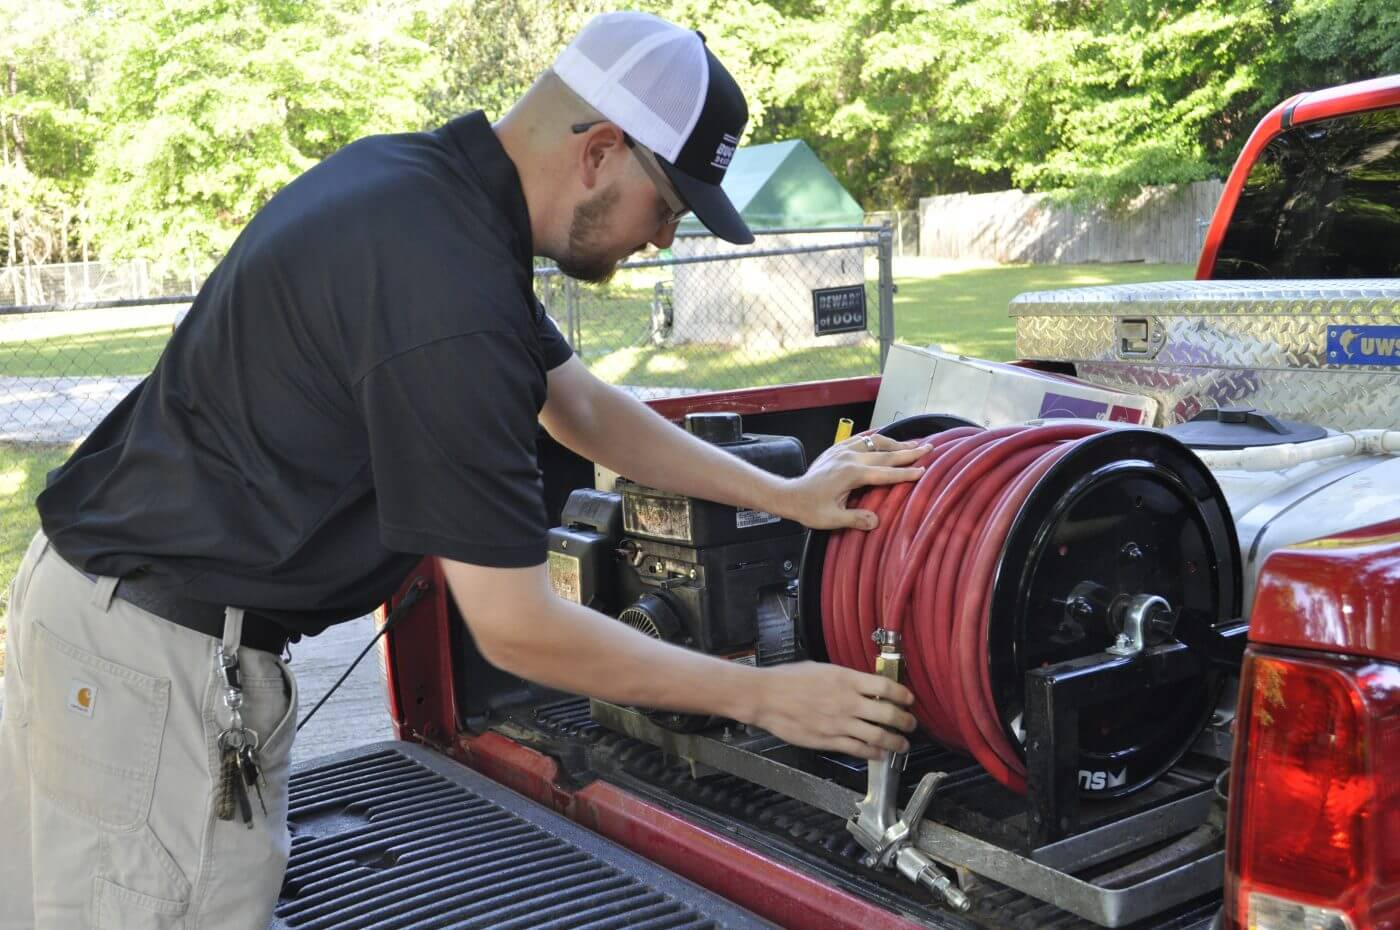 Bug House Warner Robbins employee working on pest control